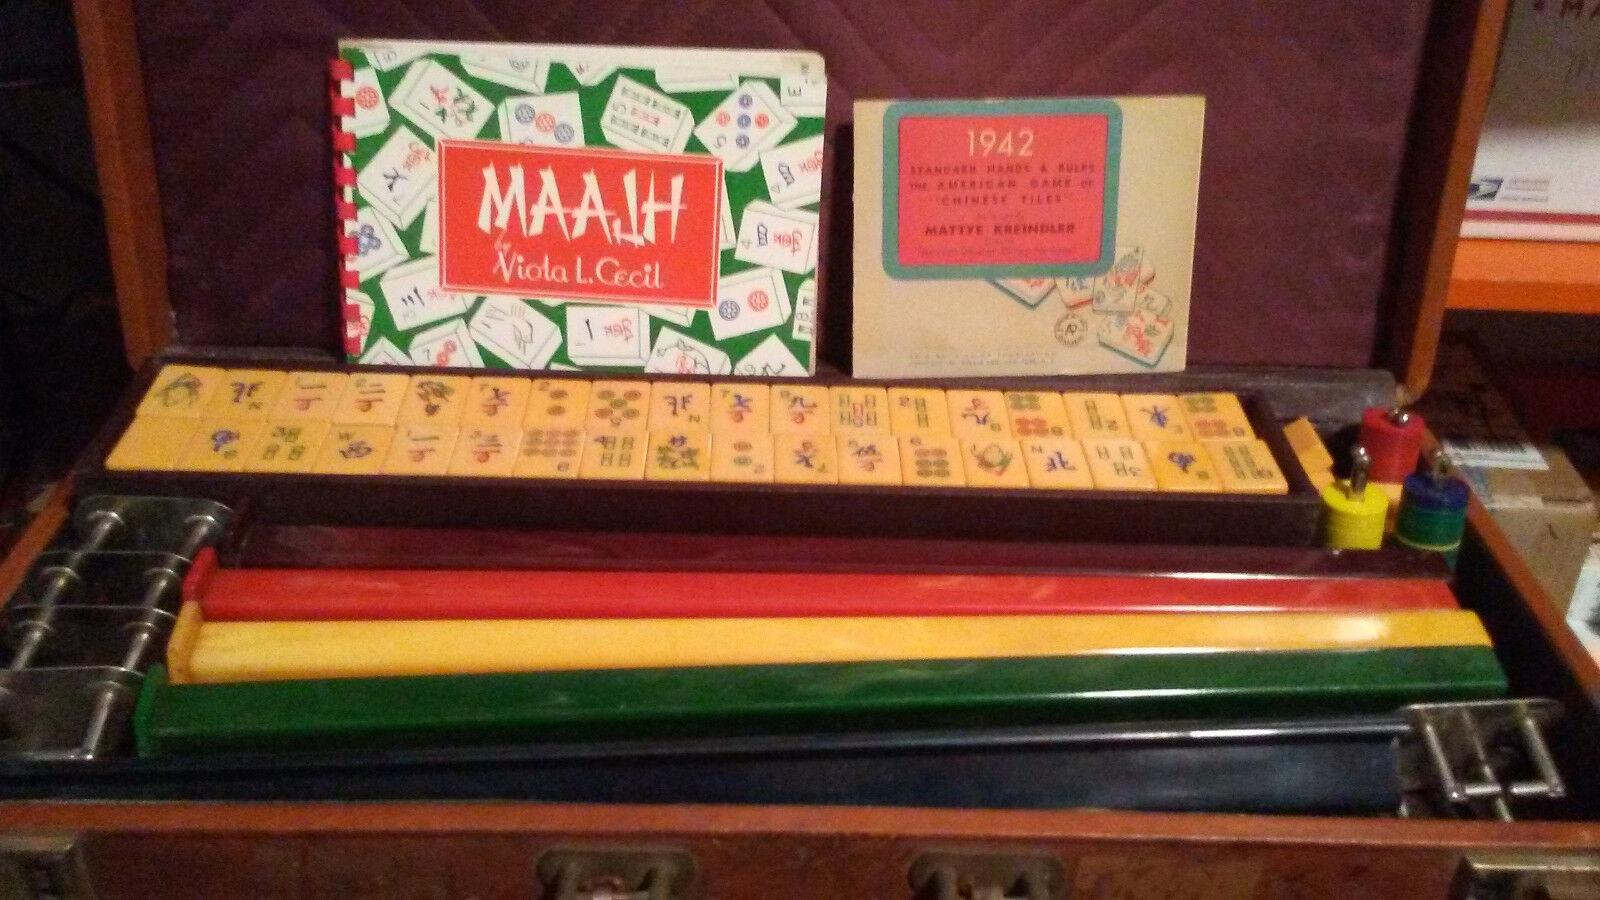 1942 AP GAMES Butterscotch Bakelite Mahjong / MAAJH 149 TILES & PAPERWORK NICE